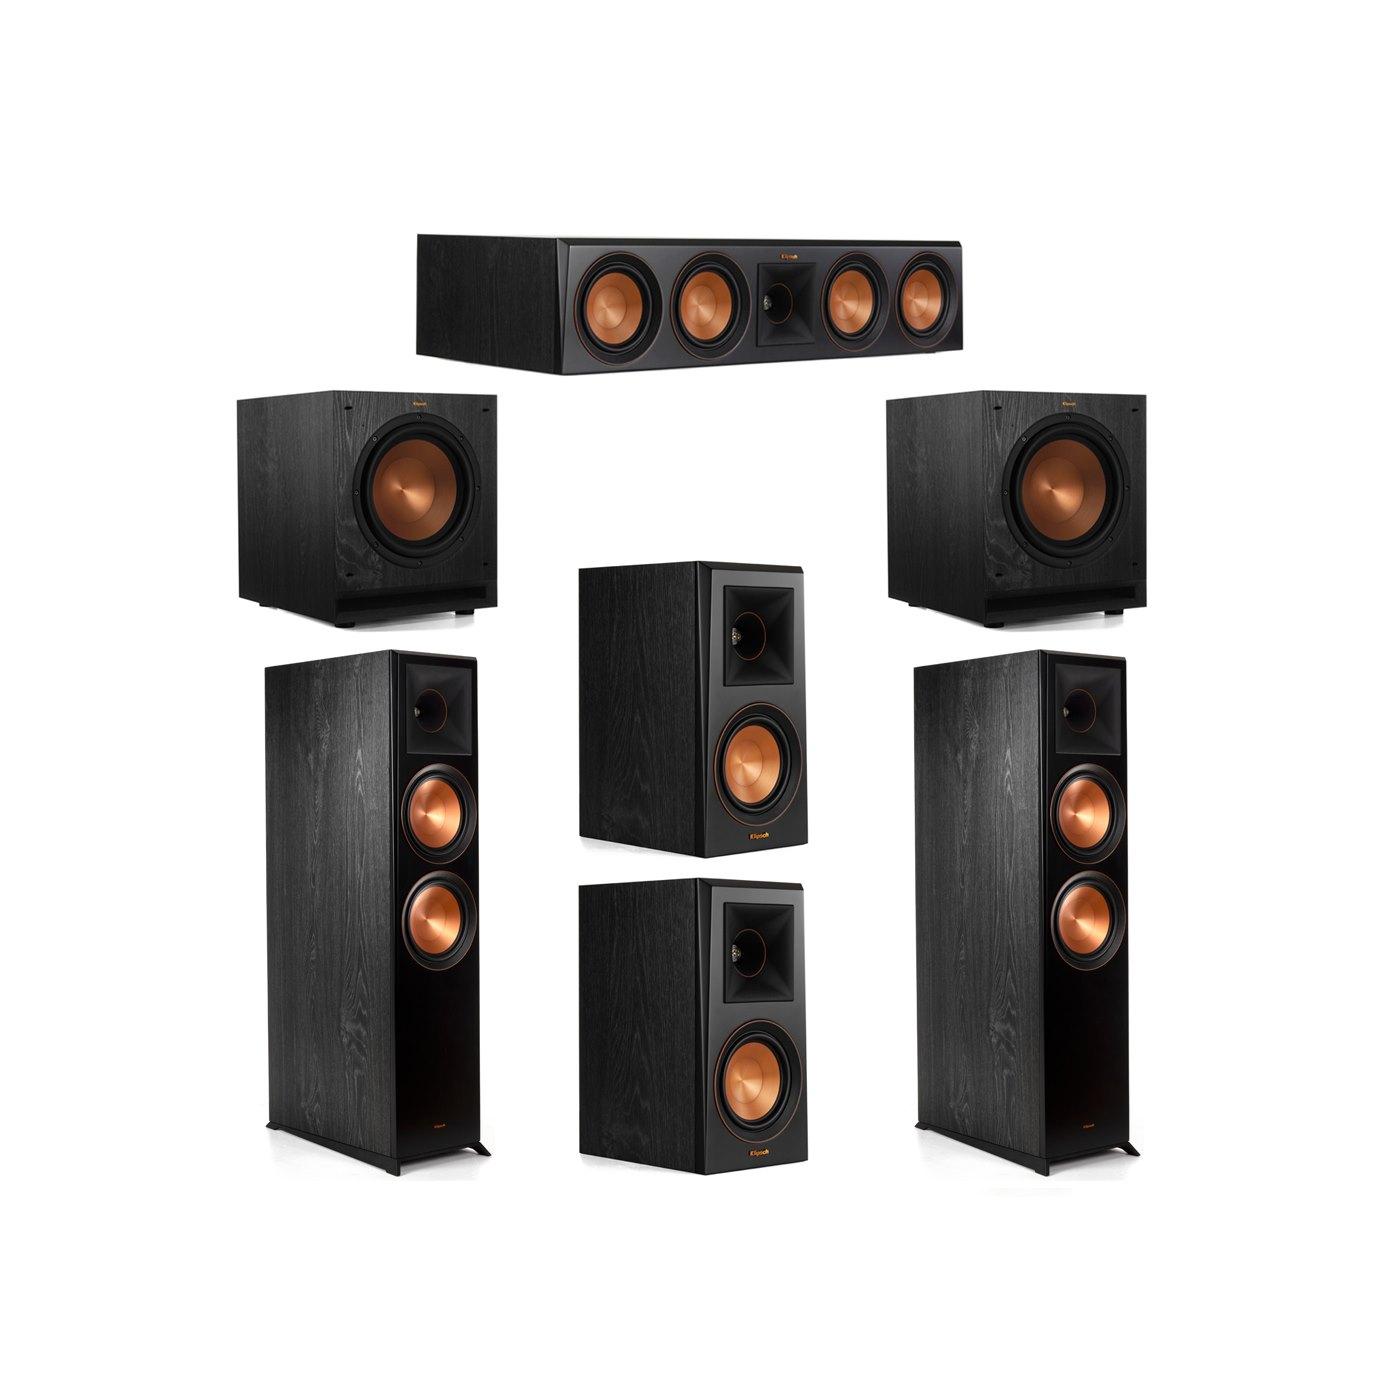 Klipsch 5.2 System with 2 RP-8000F Floorstanding Speakers, 1 Klipsch RP-504C Center Speaker, 2 Klipsch RP-500M Surround Speakers, 2 Klipsch SPL-100 Subwoofers